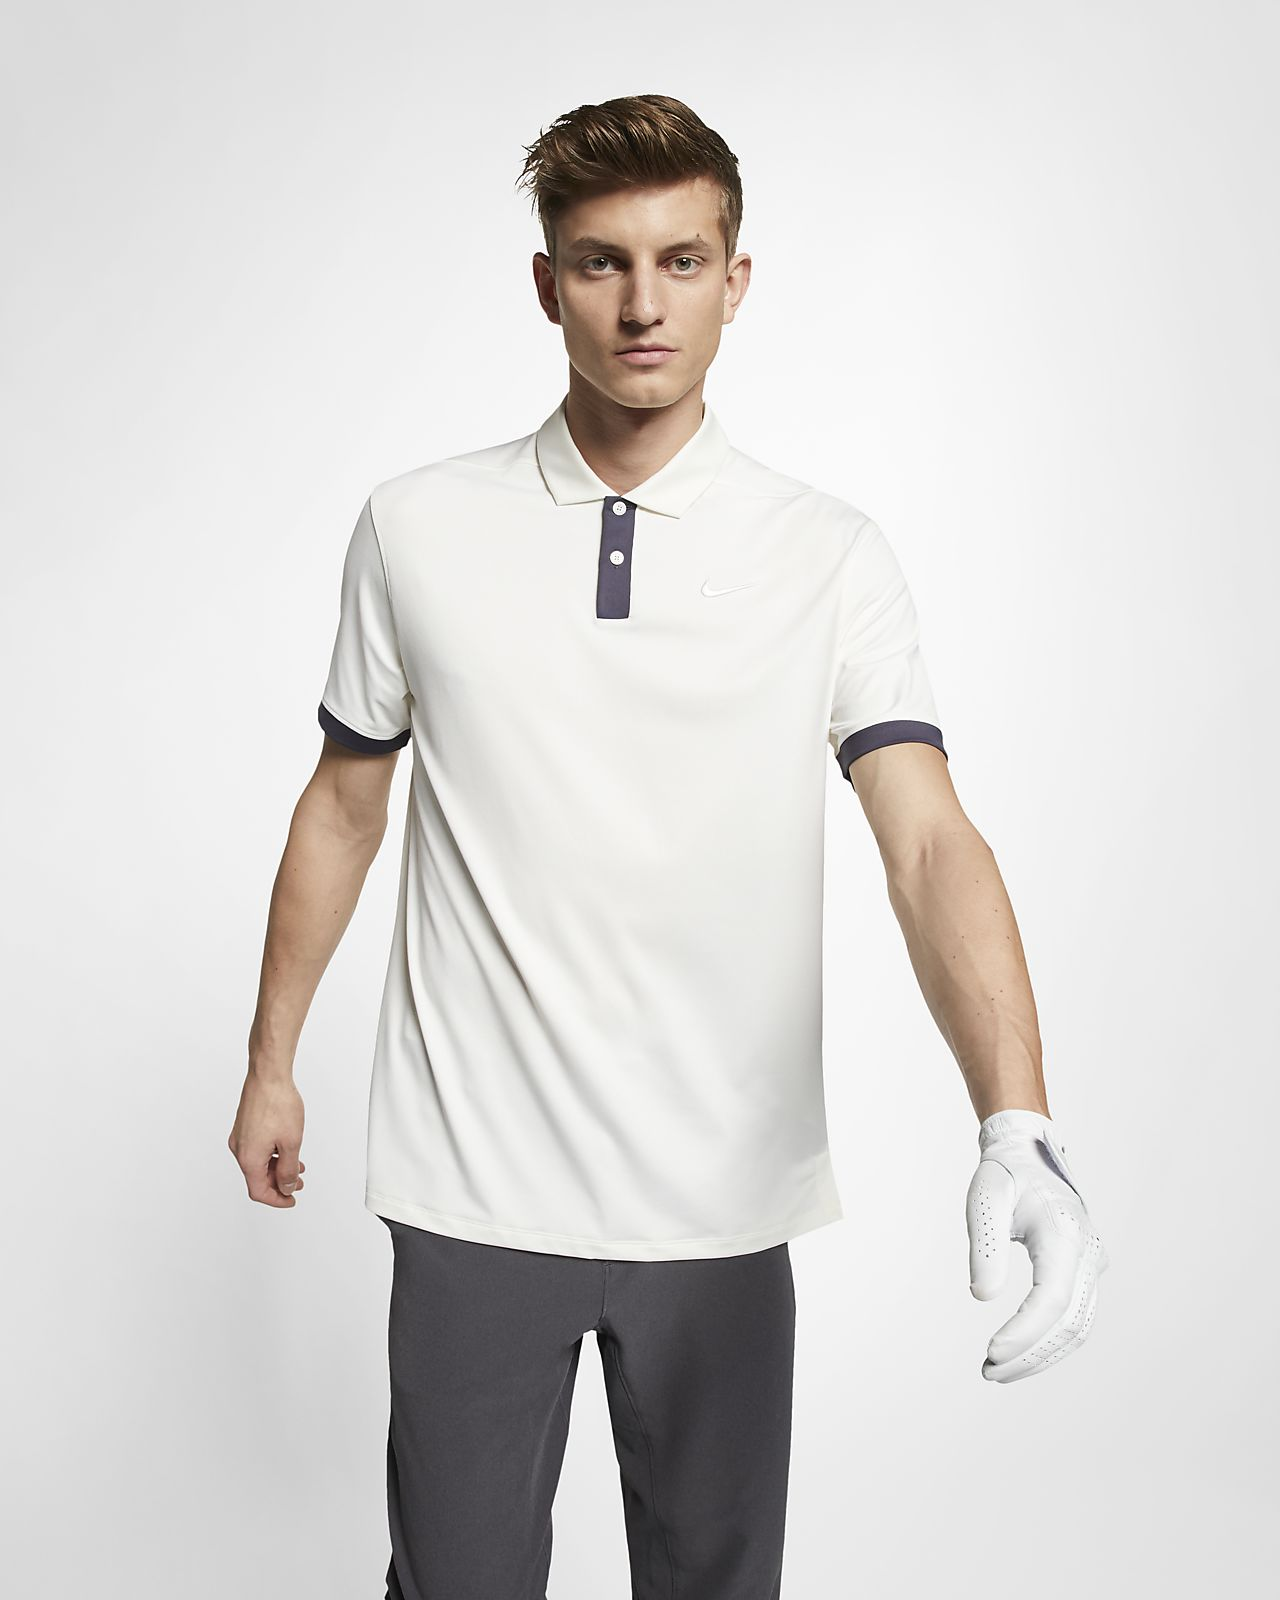 9498a277 Nike Dri-FIT Vapor Men's Golf Polo. Nike.com